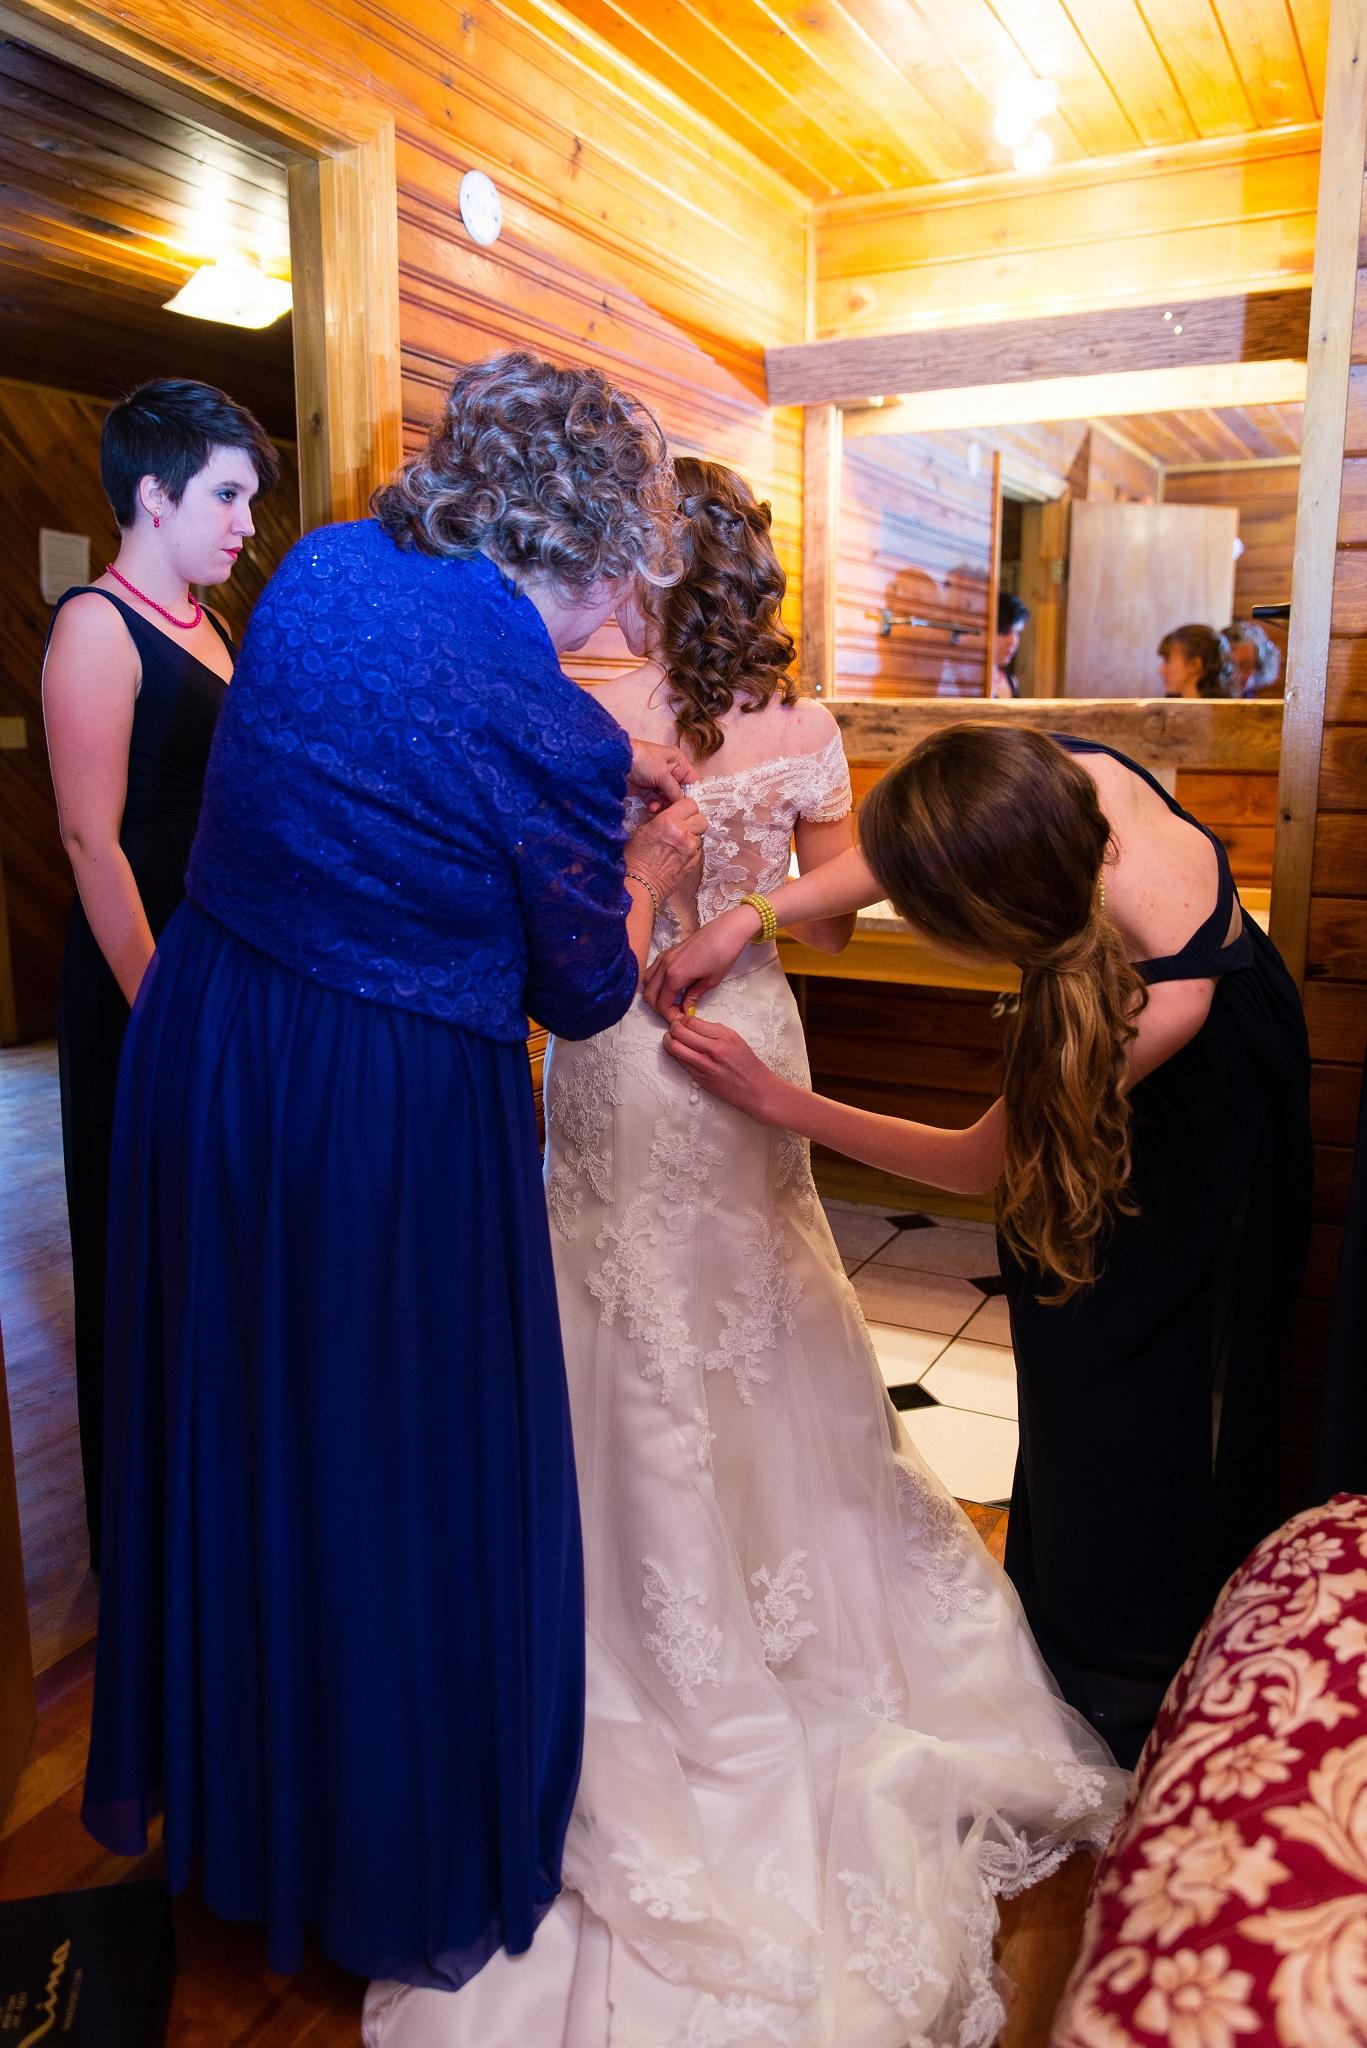 kentucky wedding, rrg, red river gorge wedding, cliffview resort, ky wedding photographers